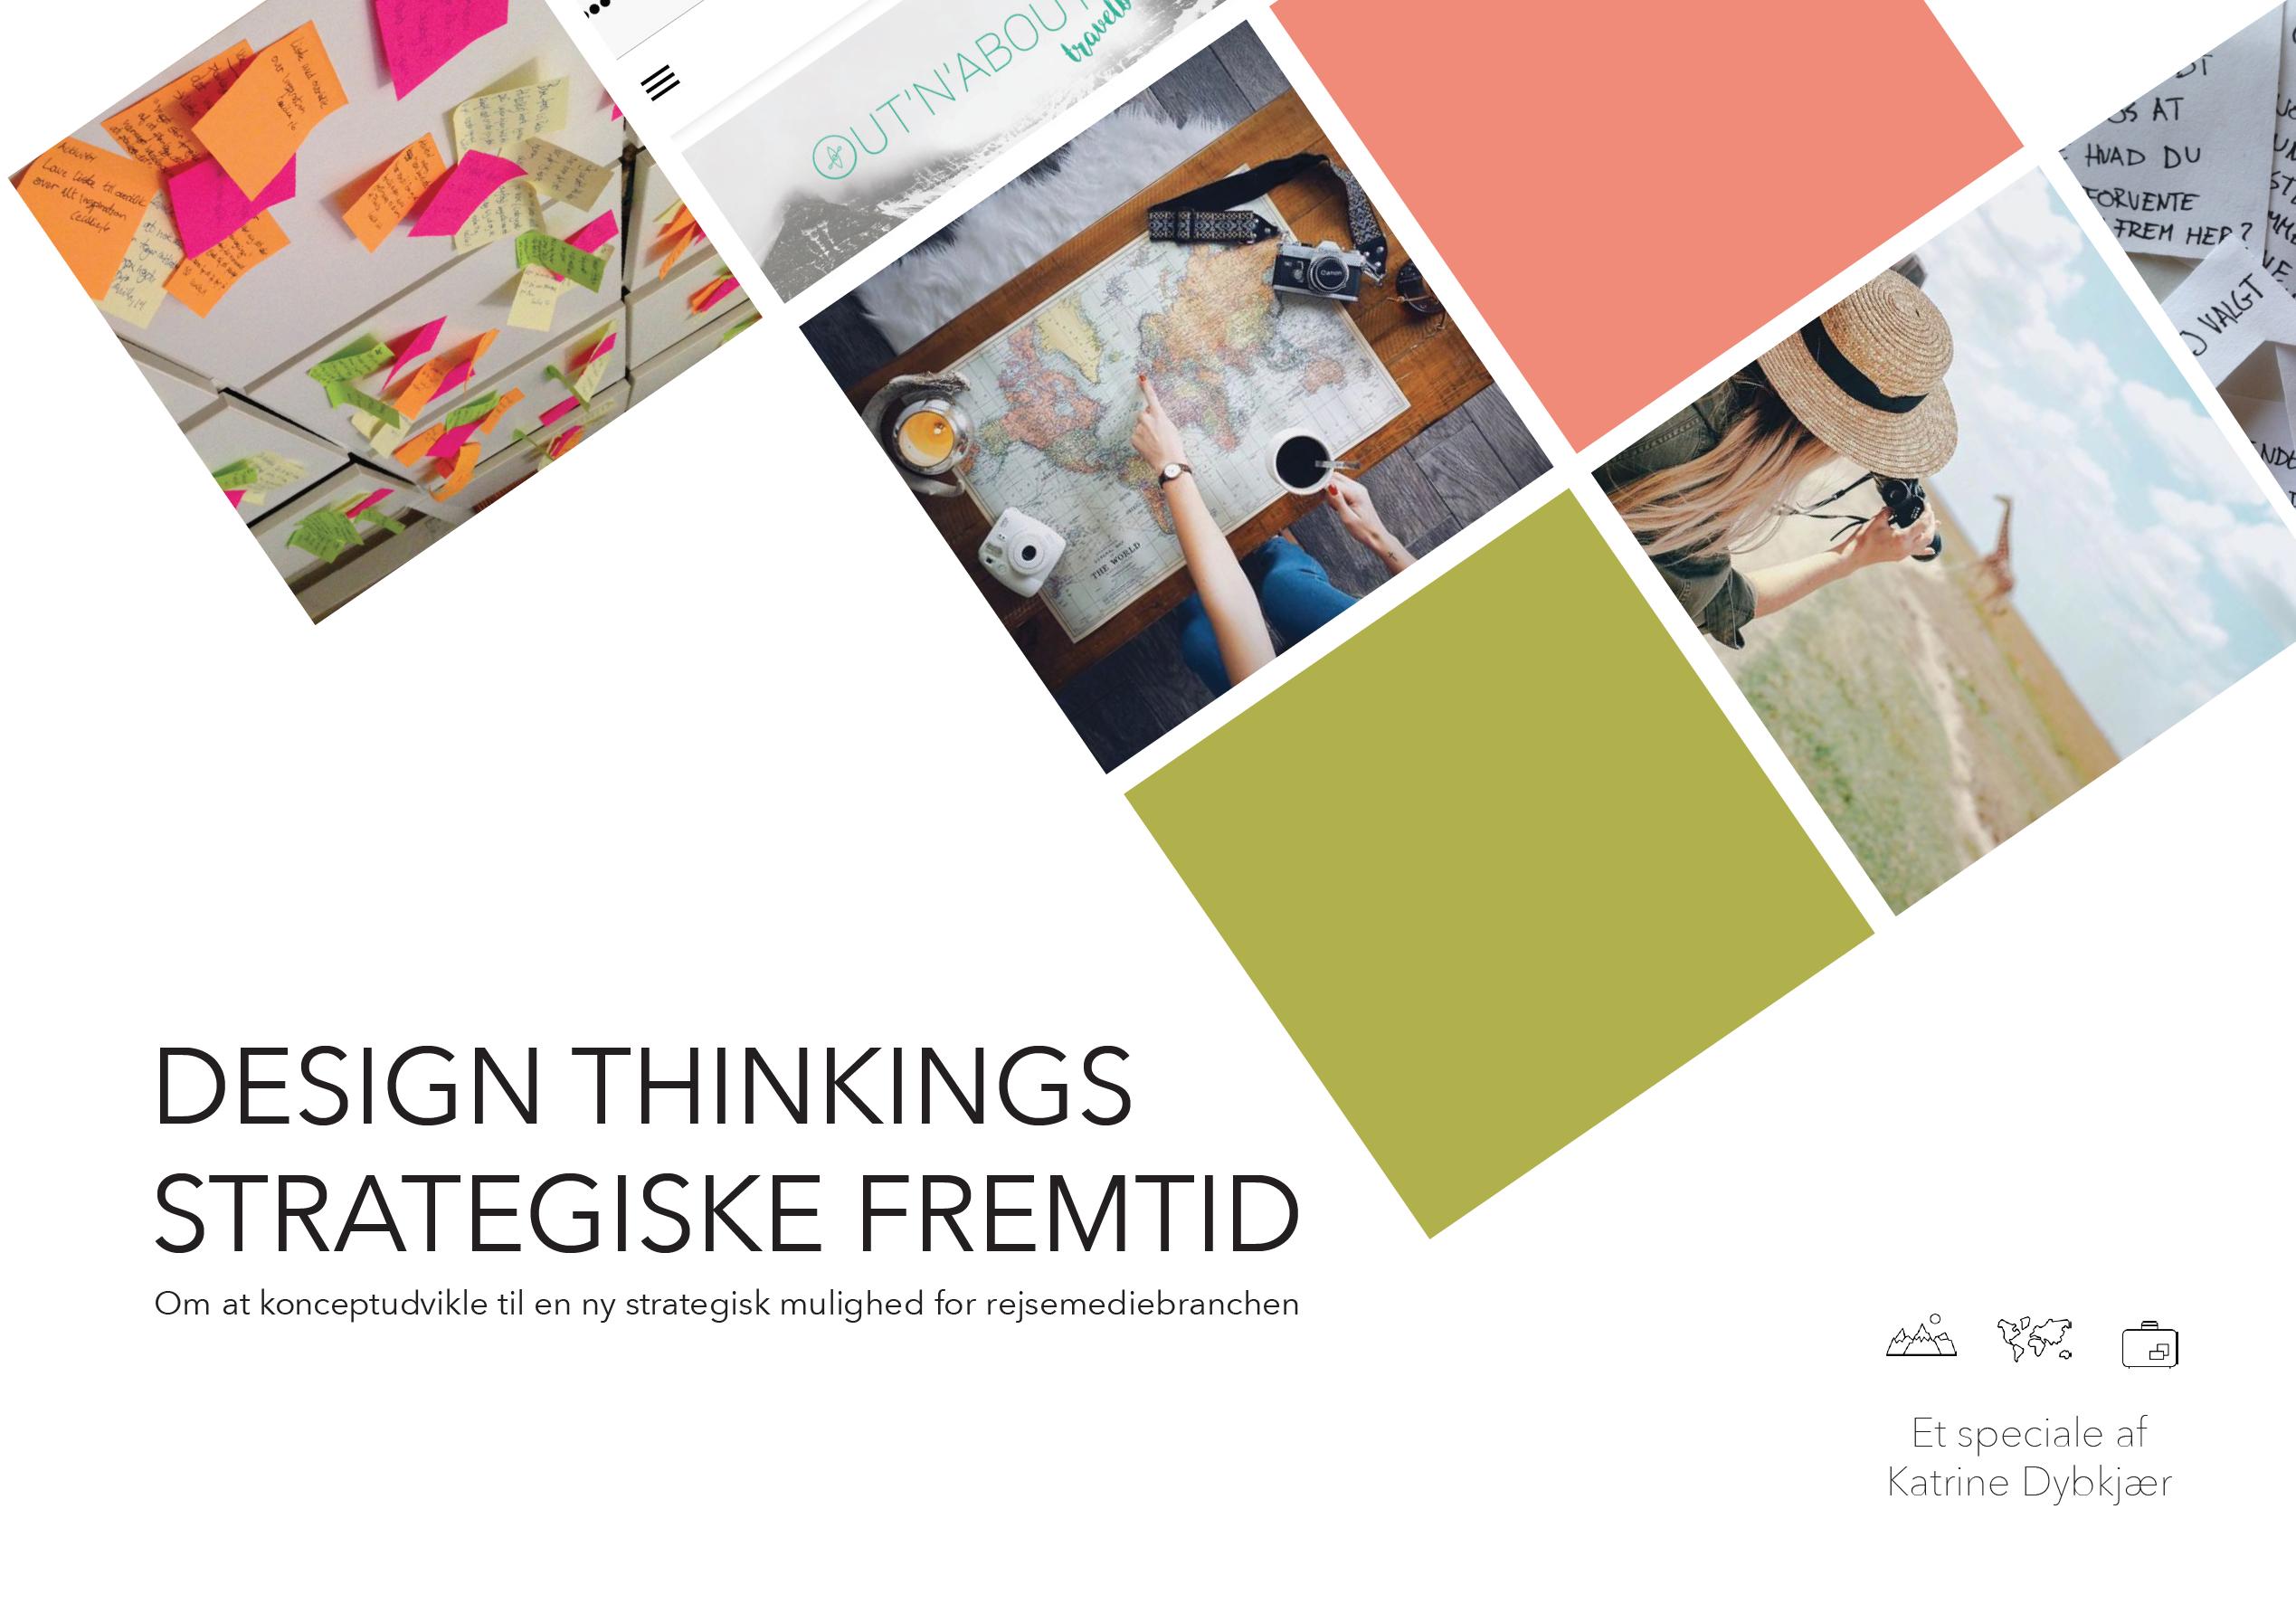 speciale_design_thinking_katrine_dybkjaer